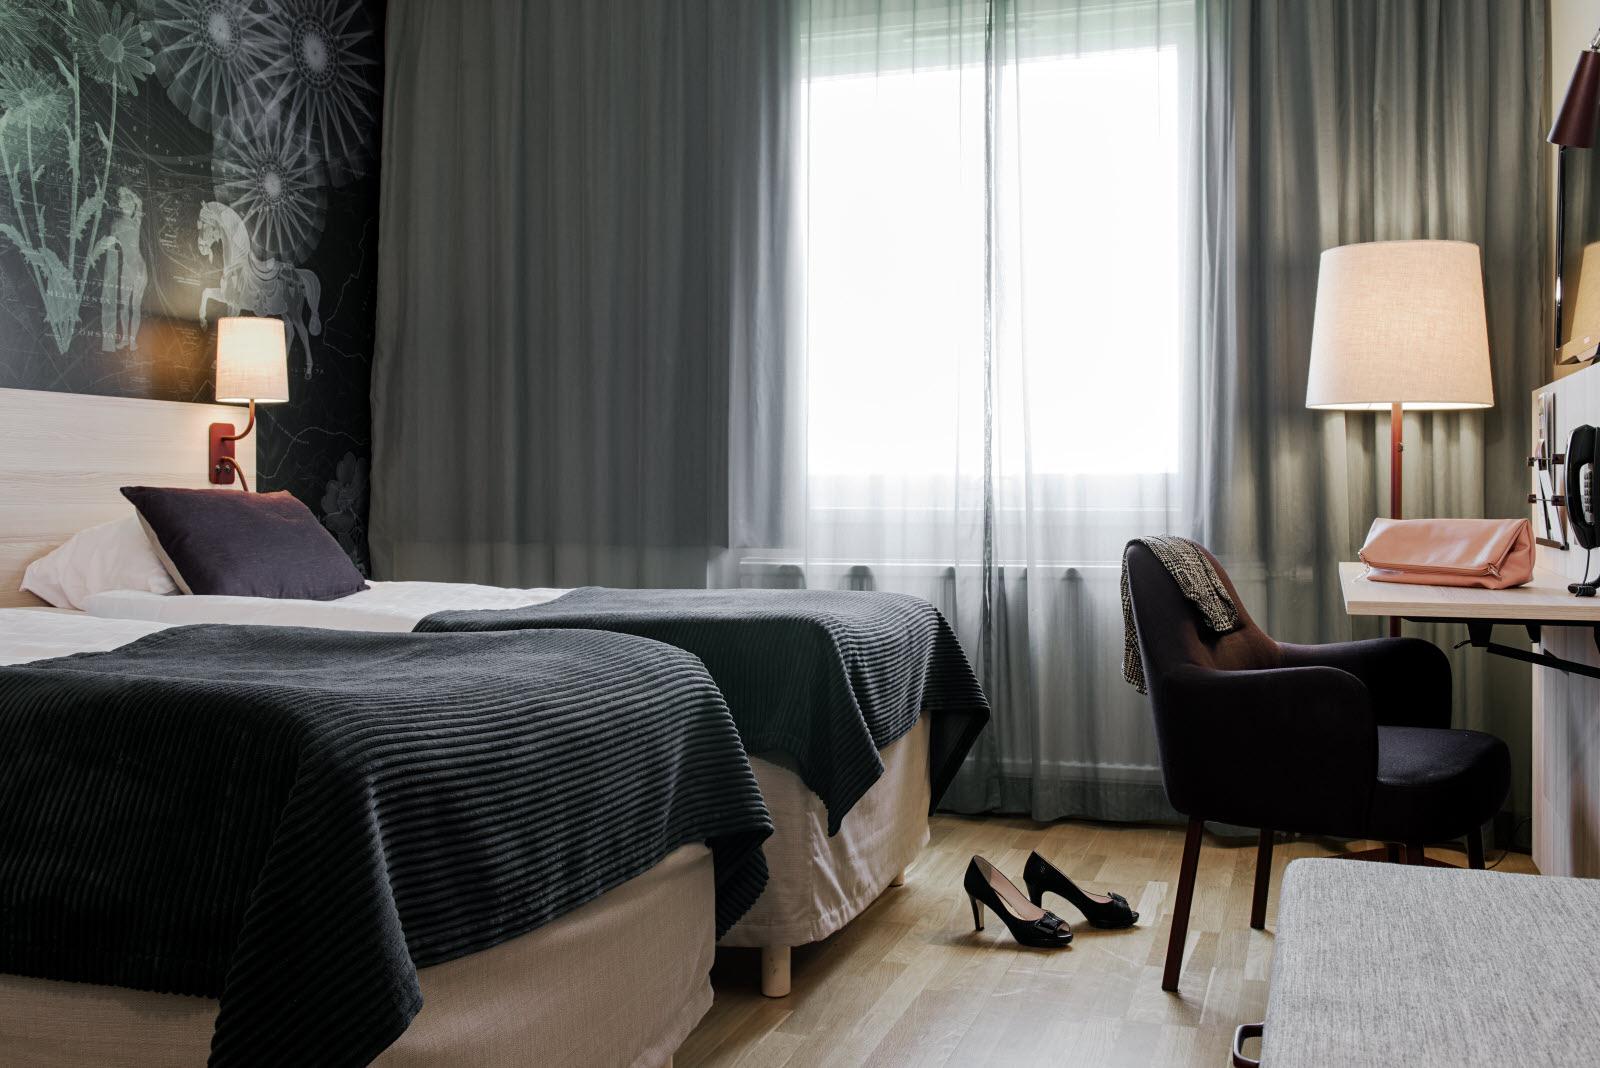 Scandic Segevang Hotel In Malmo Scandic Hotels